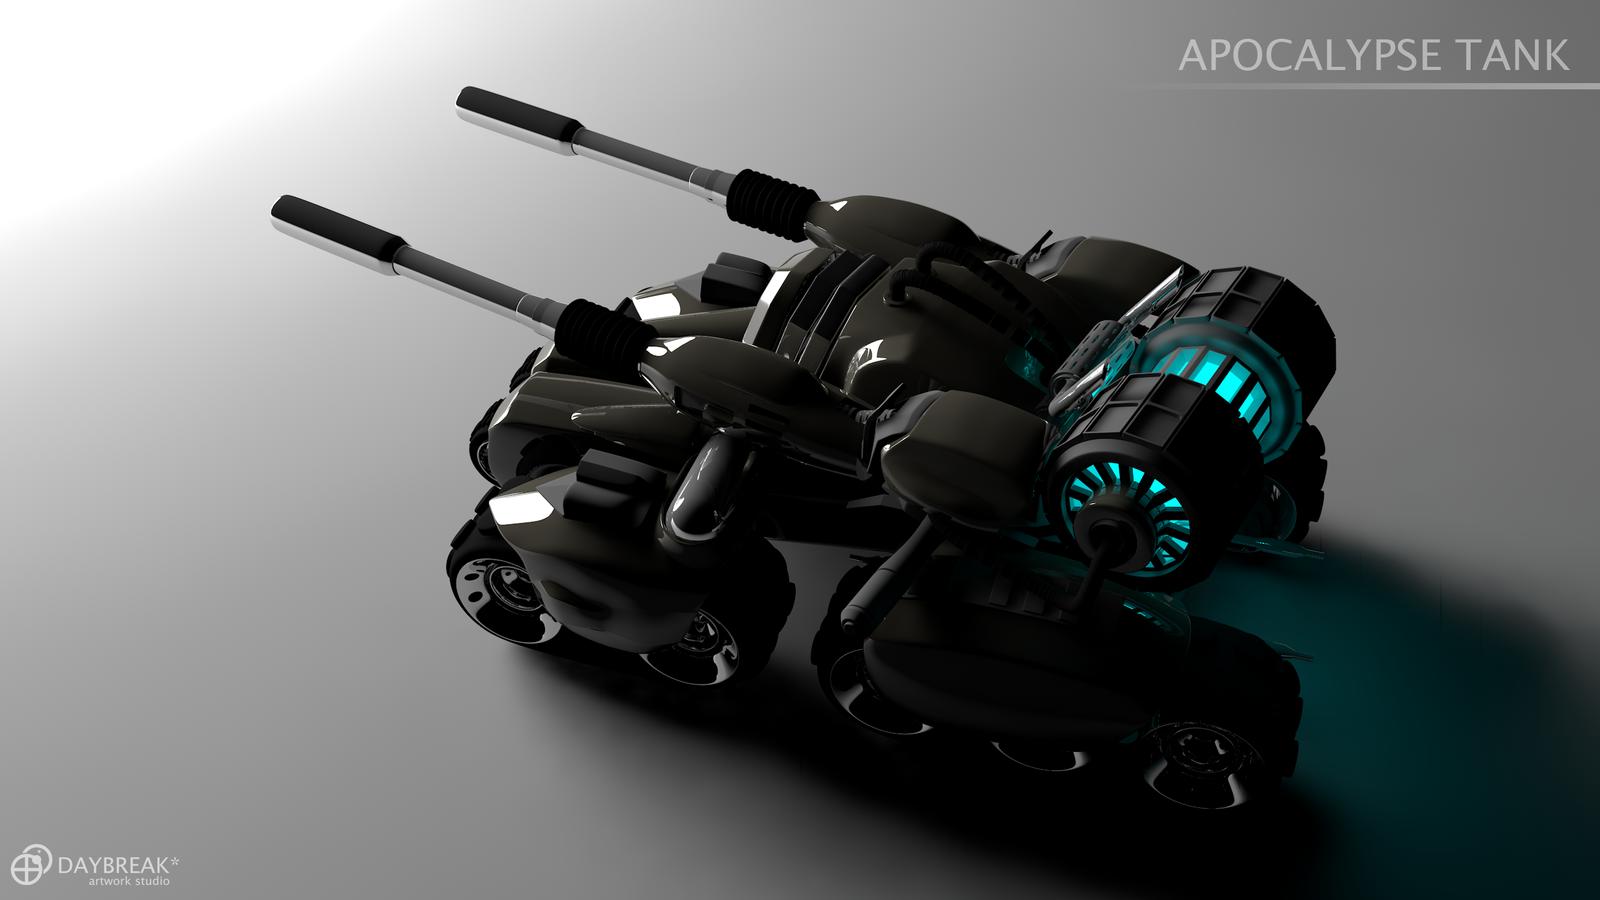 Apocalypse Tank By Daybreak Asterisk